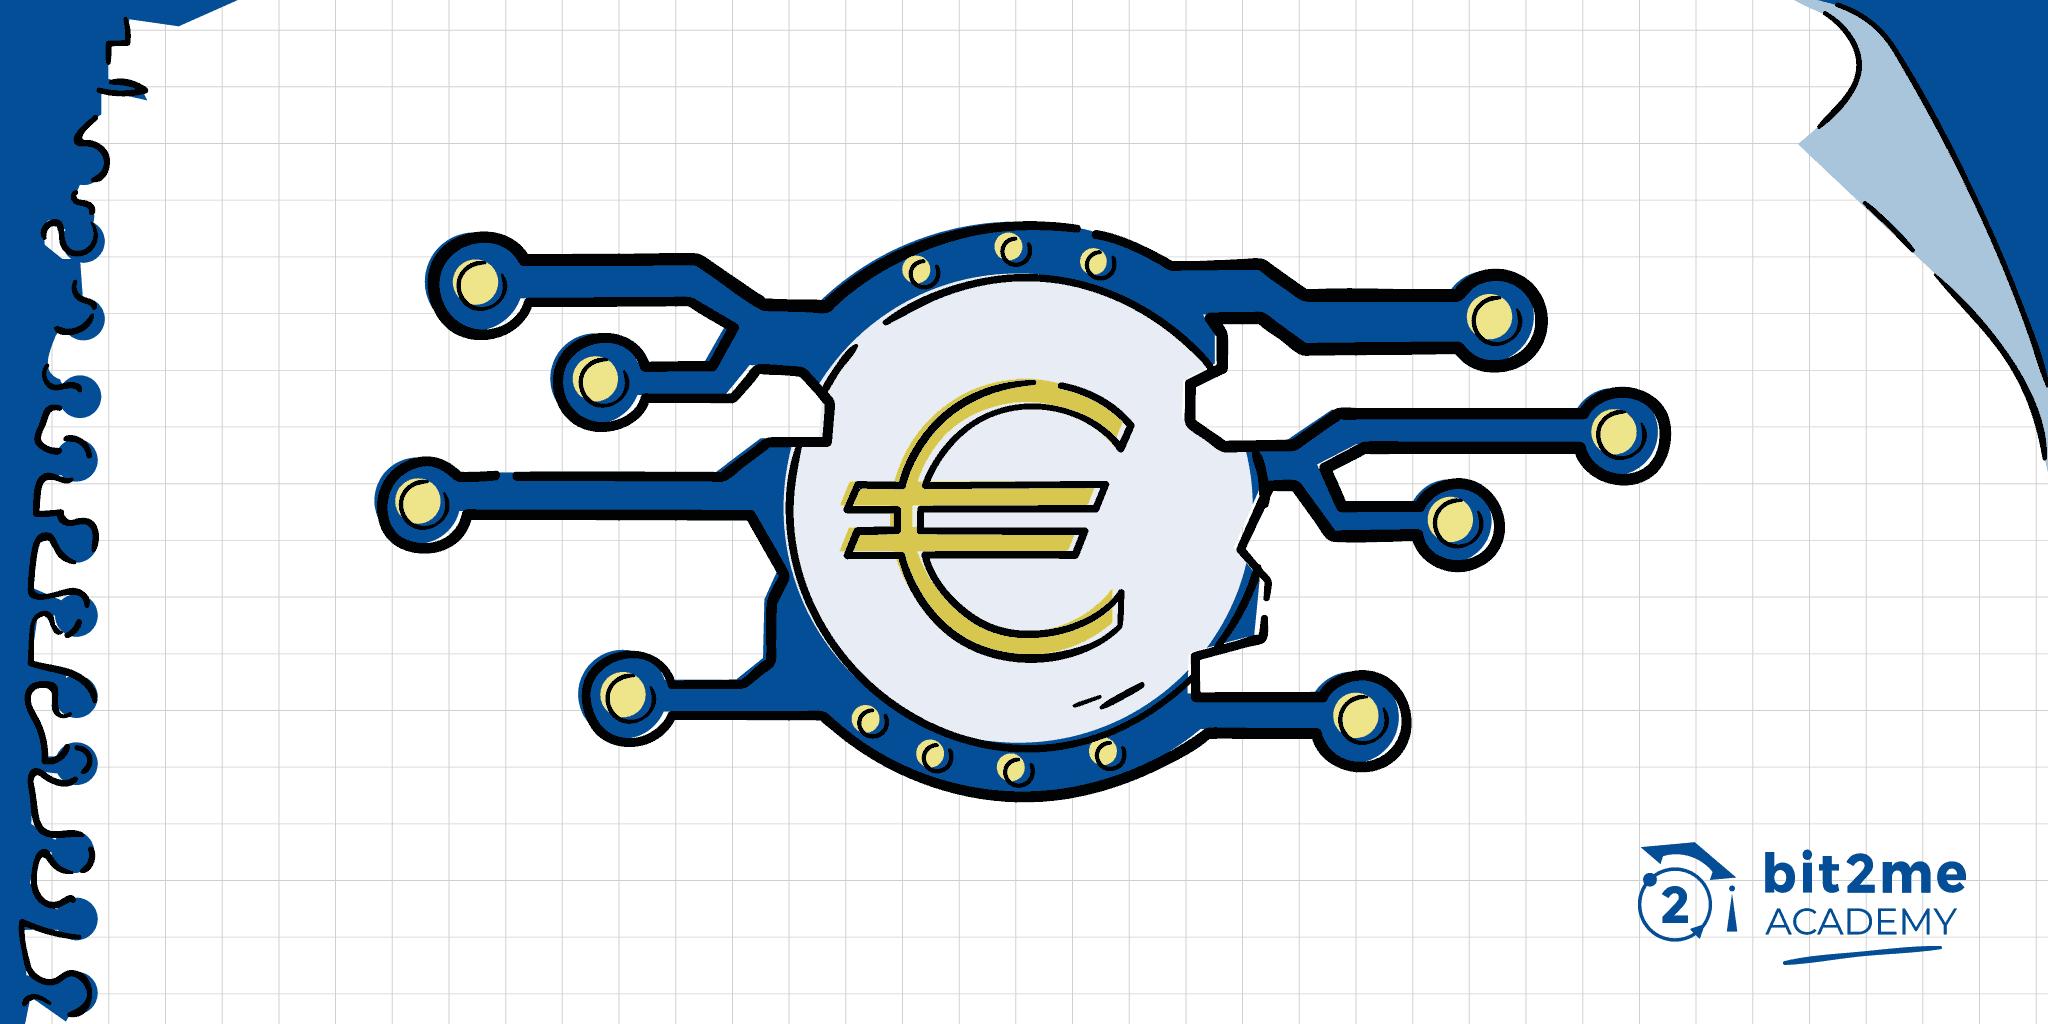 que es criptoeuro, euro digital, criptoeuro